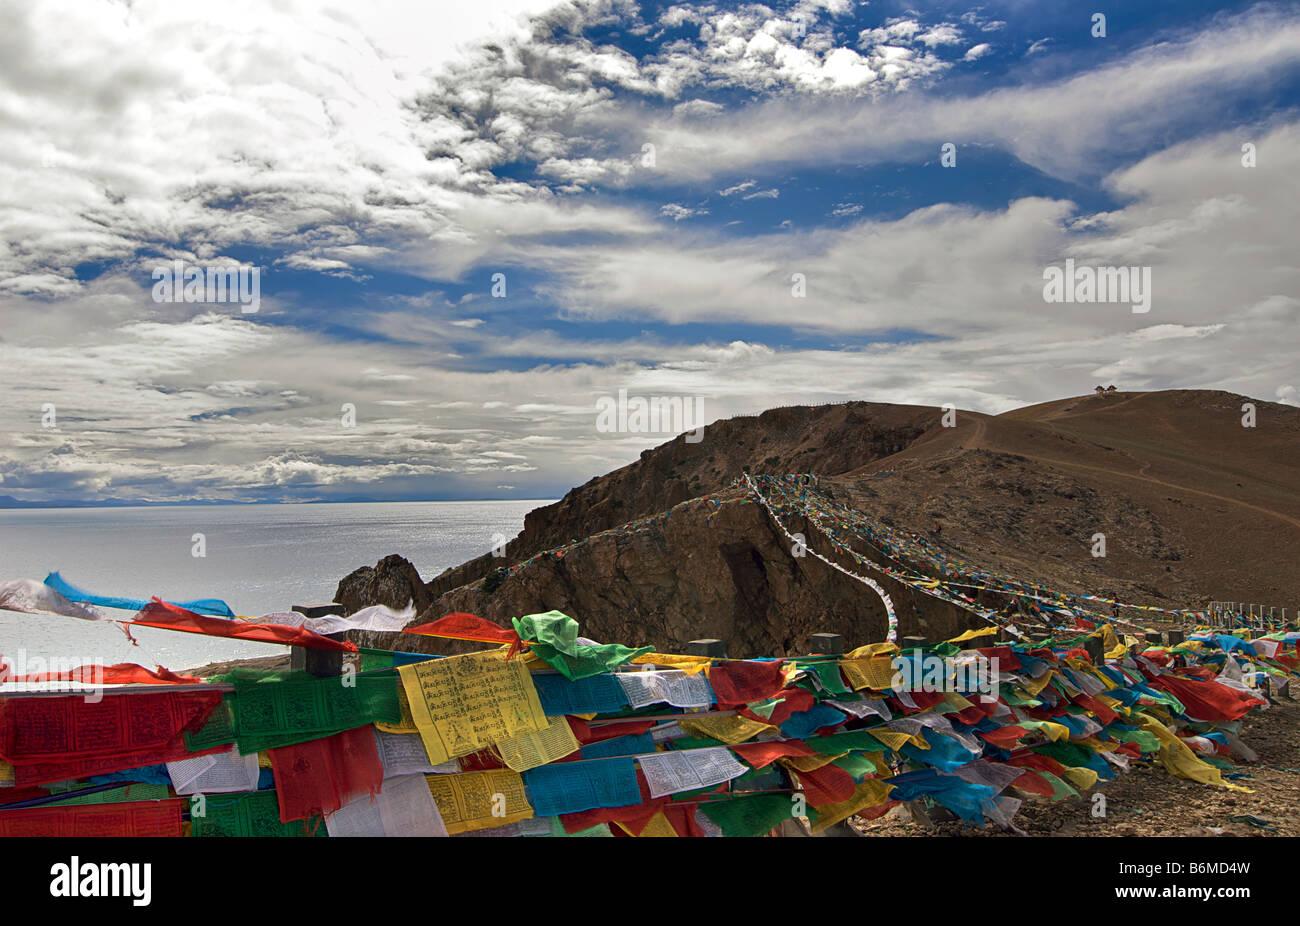 Prayerflags on a hilltop overlooking the sacred Tibetan lake at Nam Tso. Tibet - Stock Image